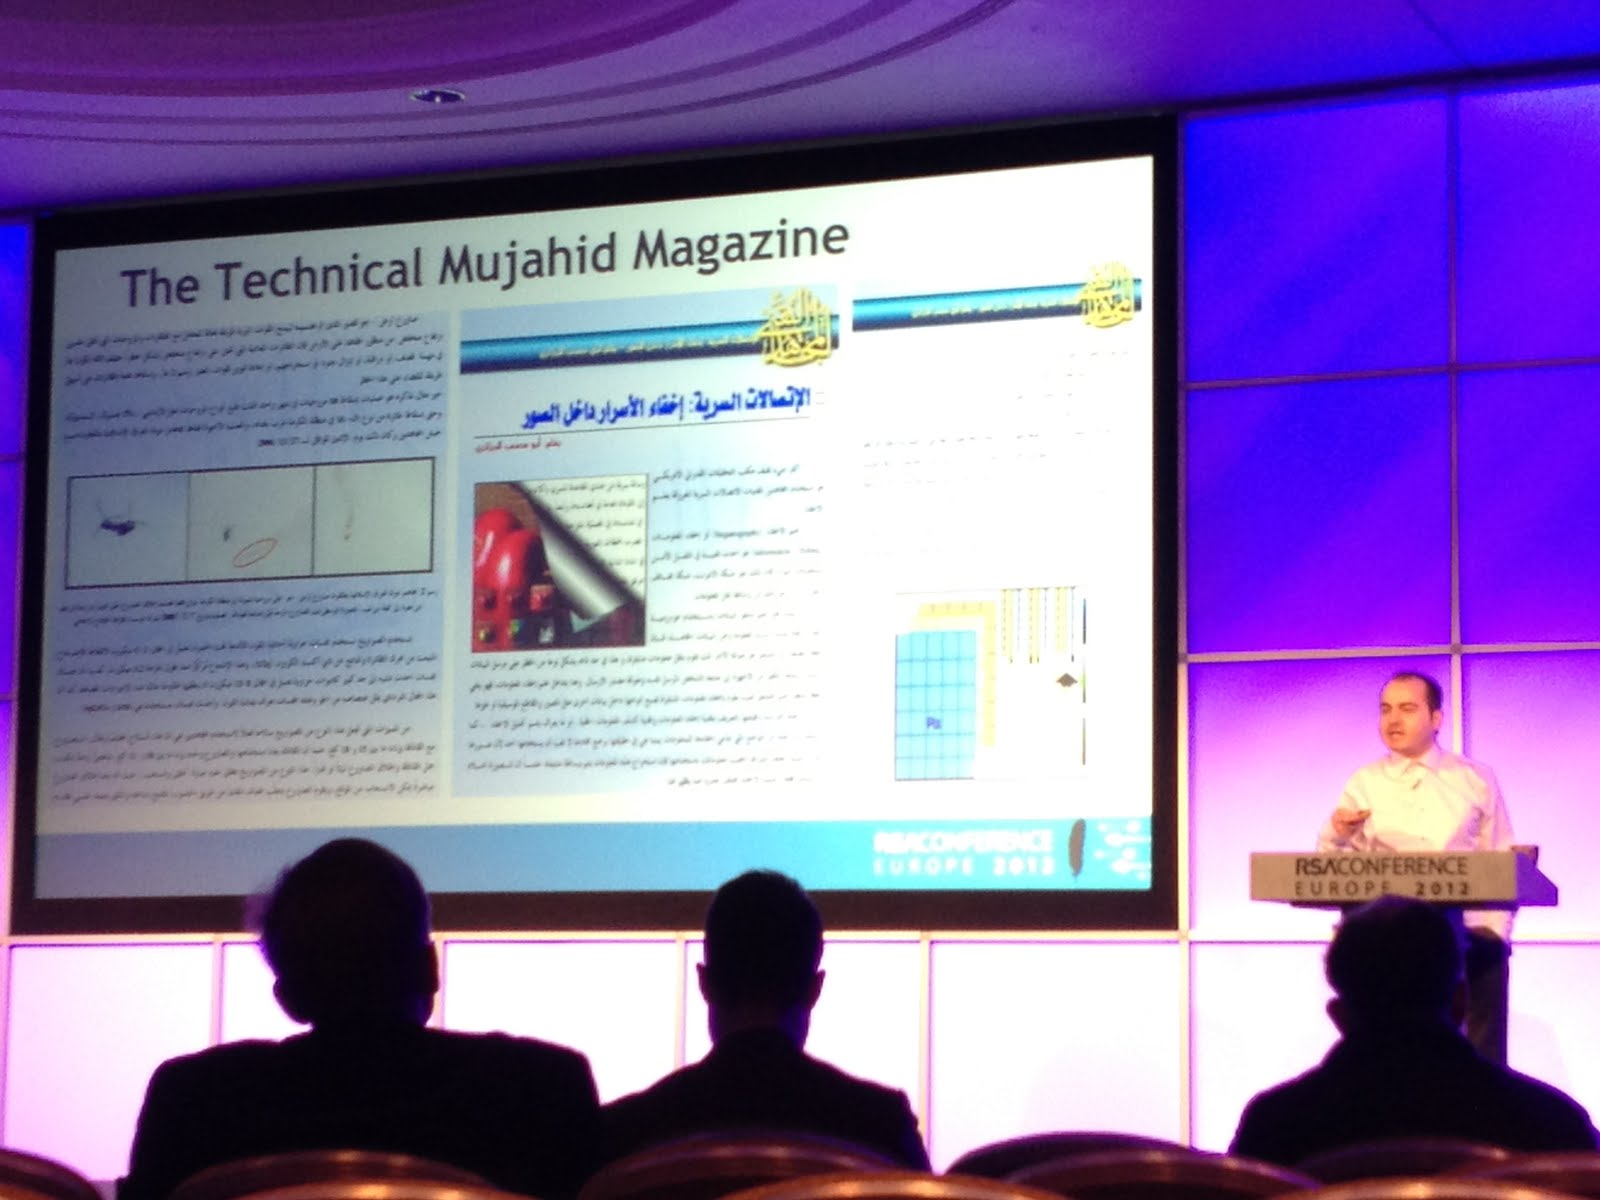 RSA Europe 2012 Presentation